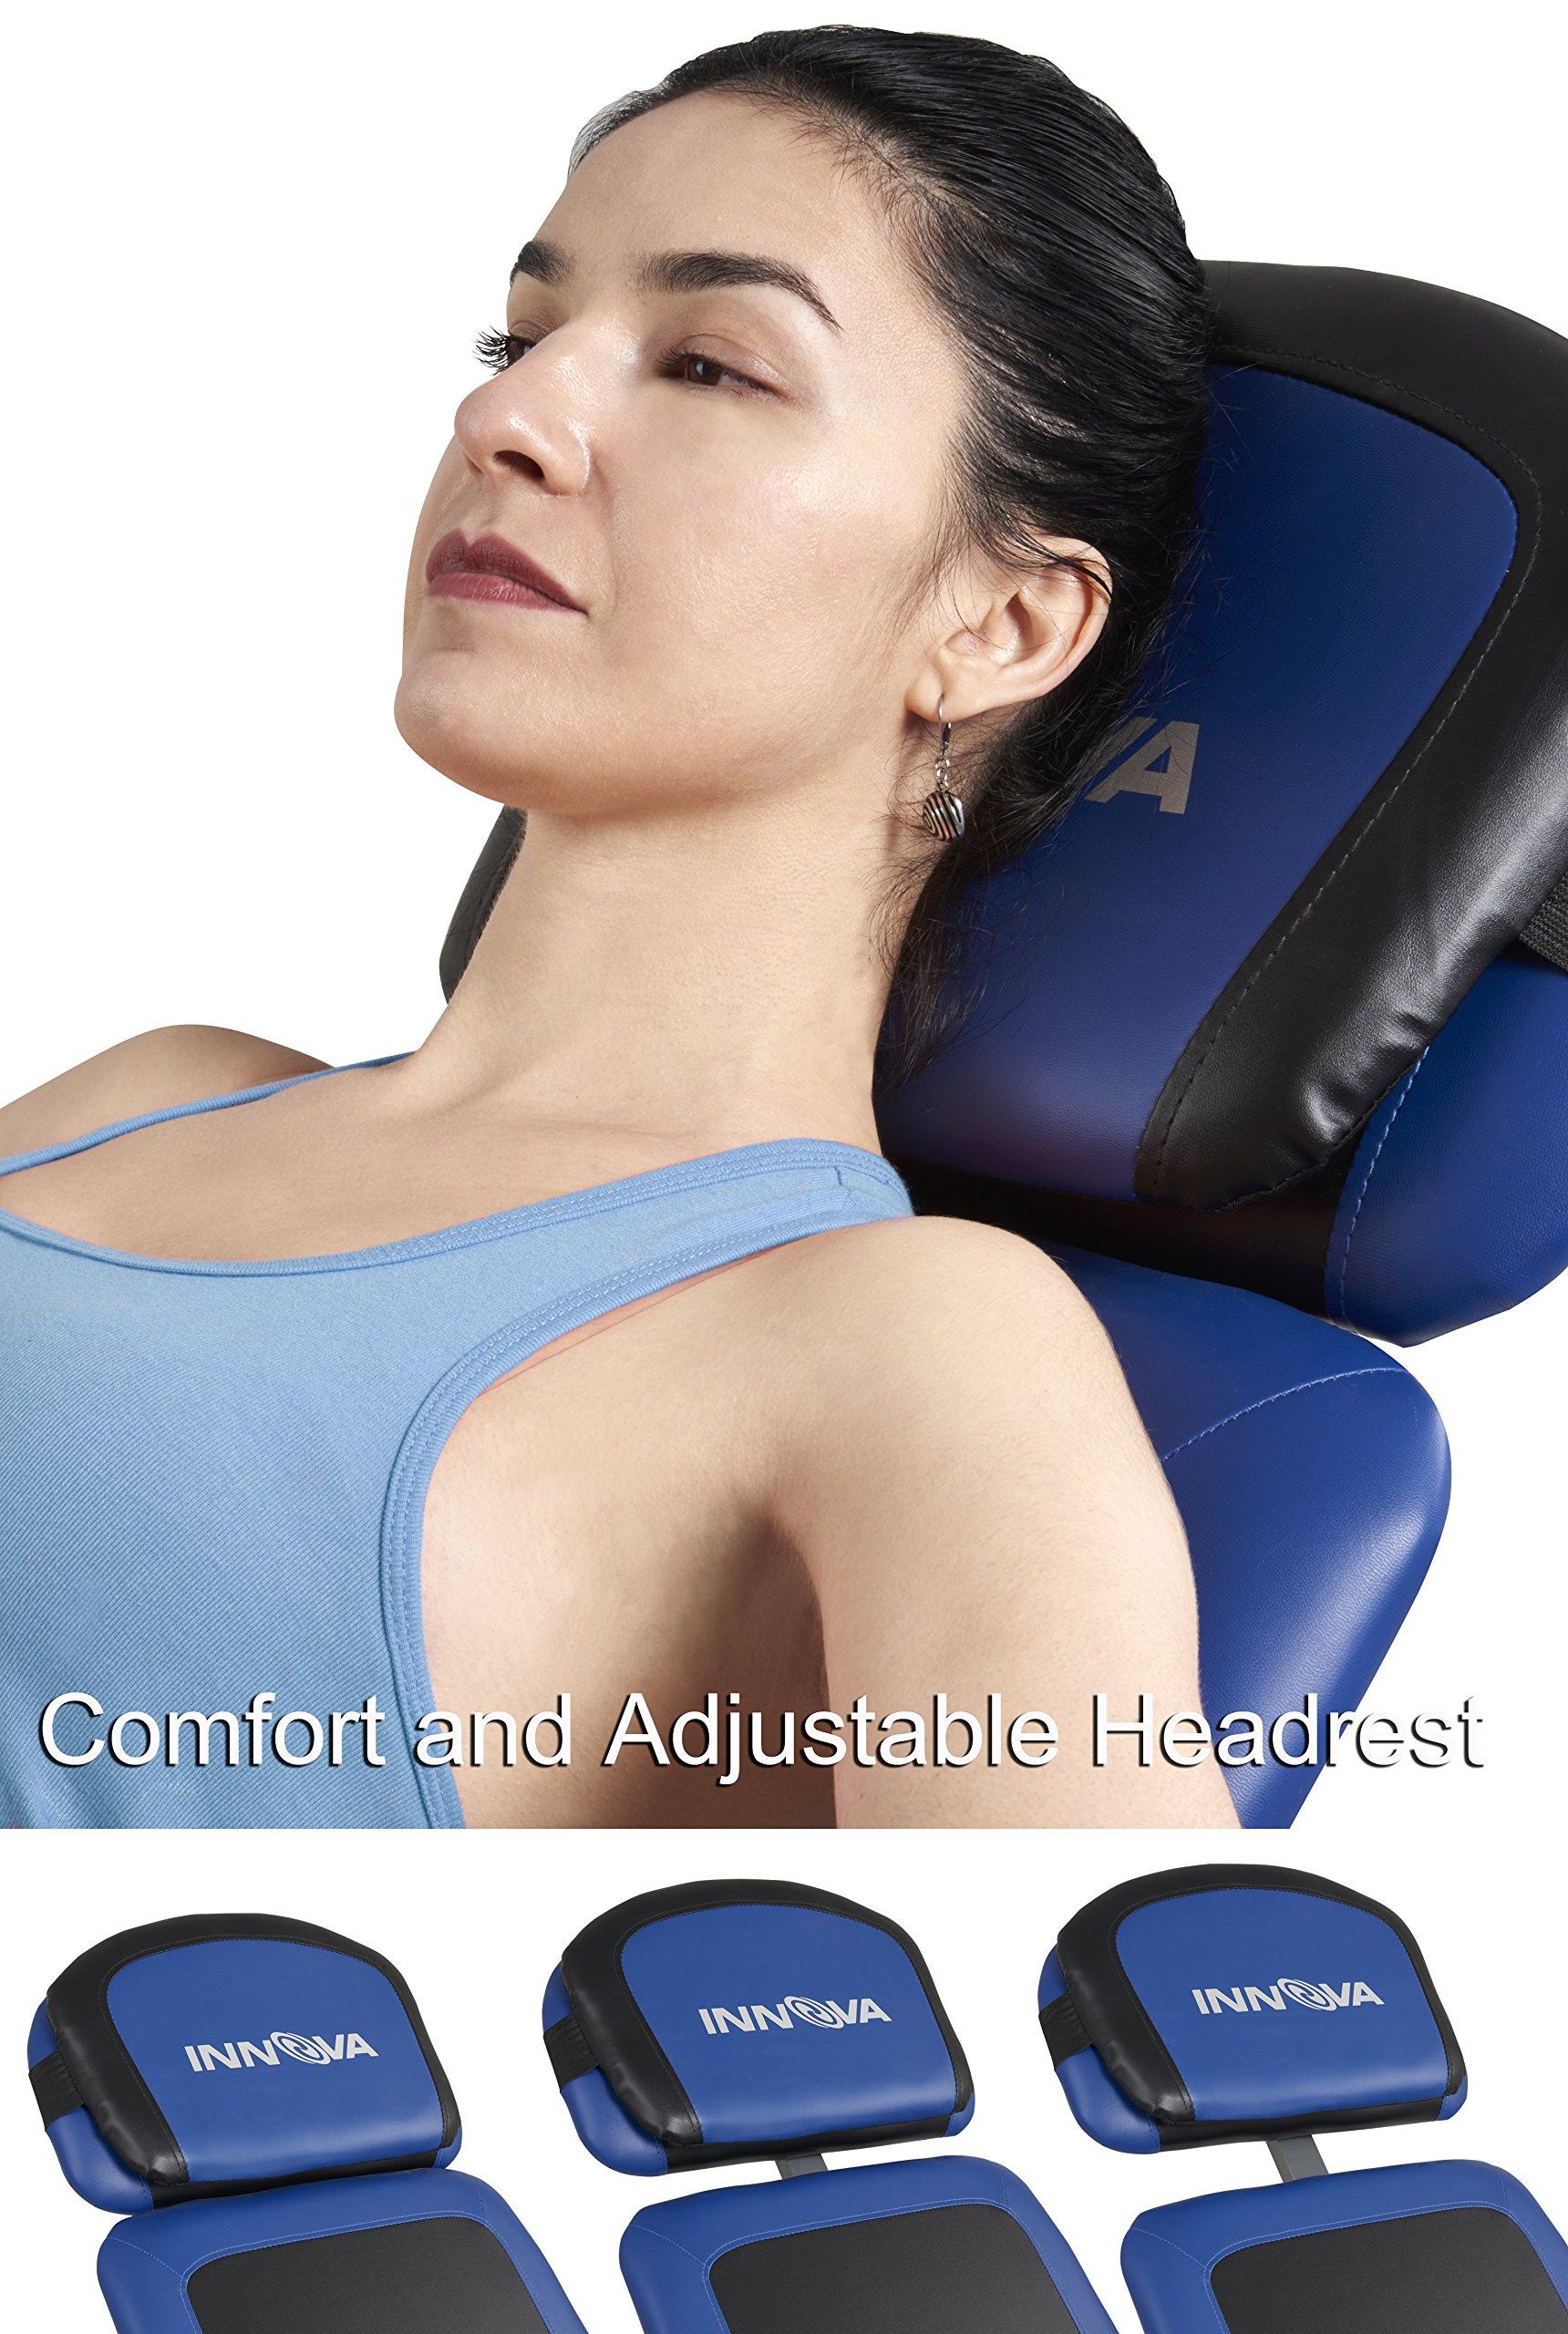 Advanced Heat and Massage Therapeutic Inversion Table